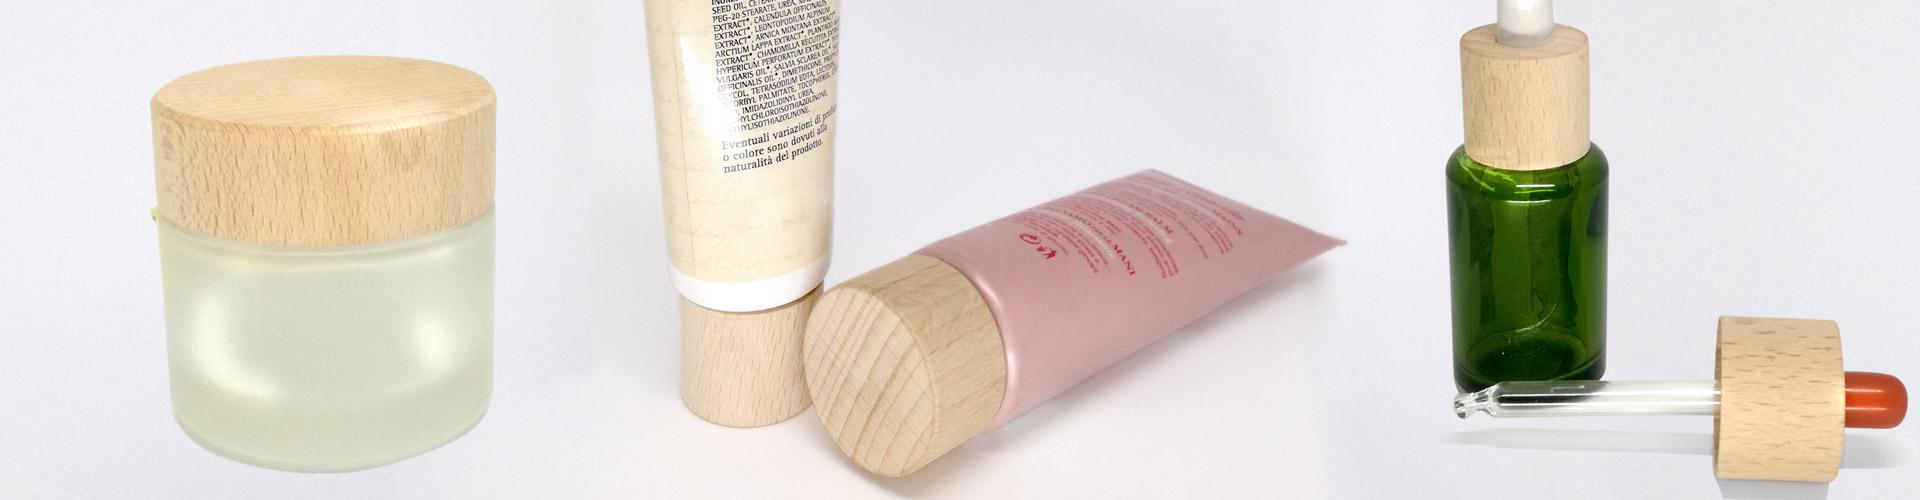 Packaging per profumi e cosmetici - header